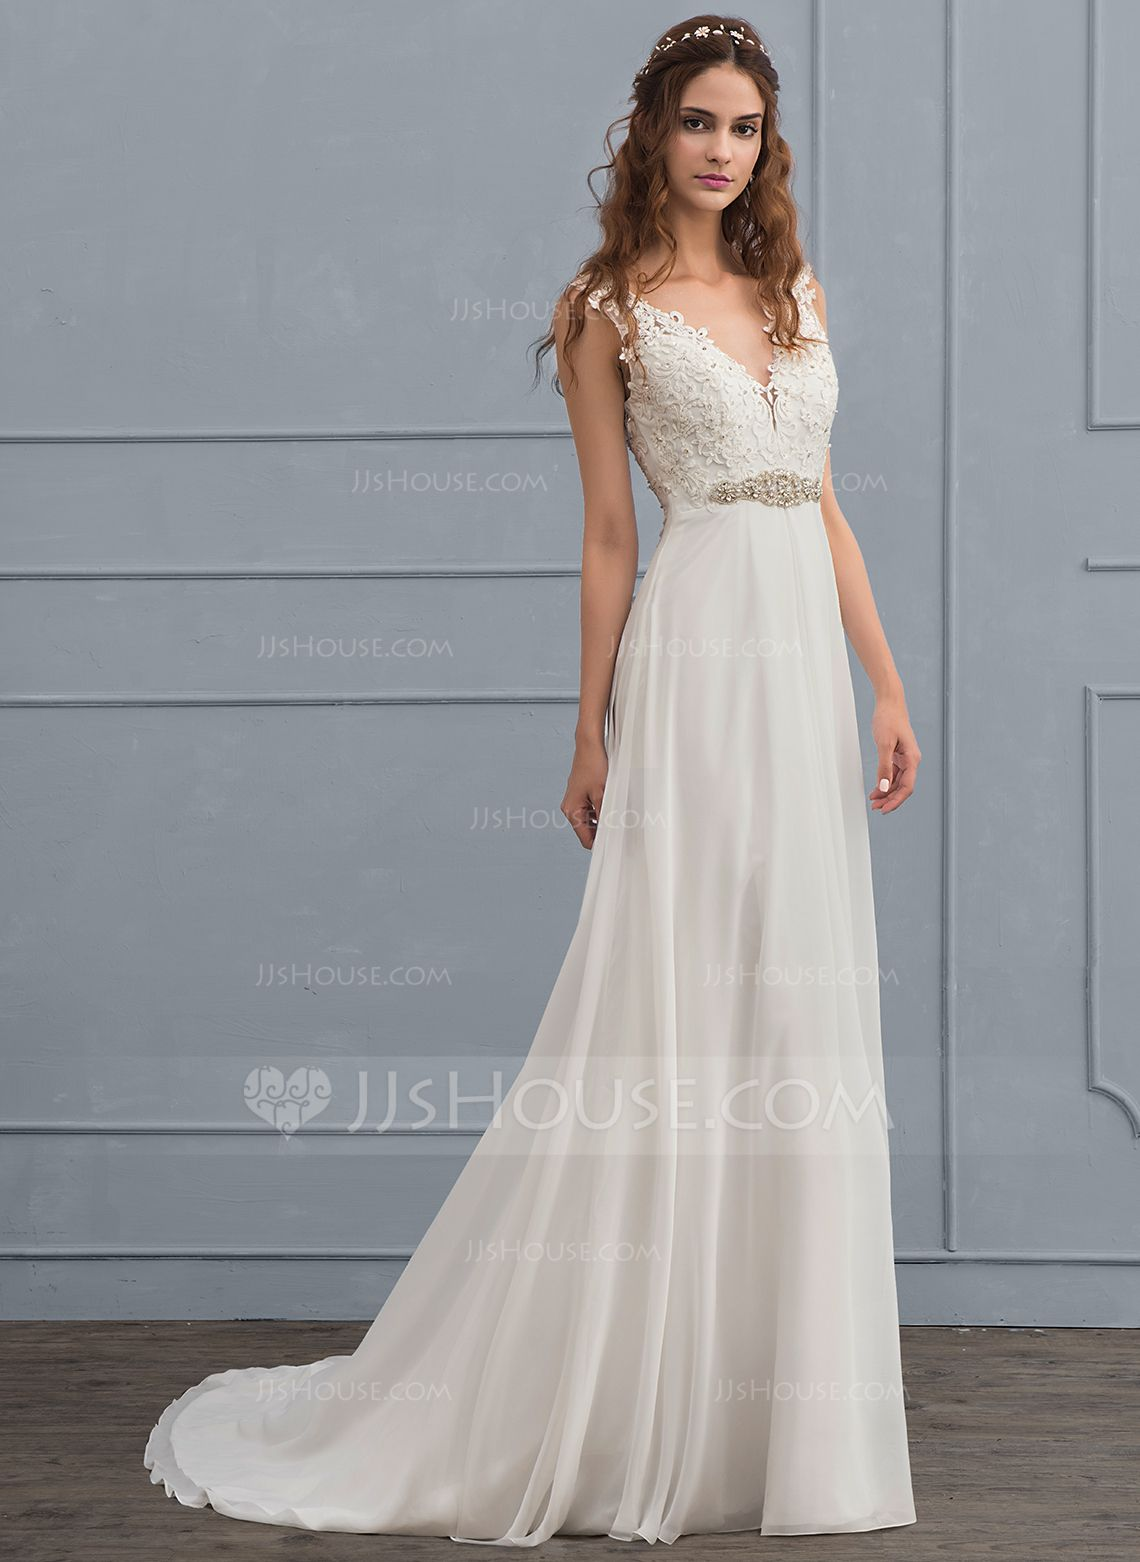 Us 192 00 A Line V Neck Court Train Chiffon Wedding Dress With Beading Sequins Jj S House Ruffle Wedding Dress Cheap Wedding Dress Chiffon Wedding Dress